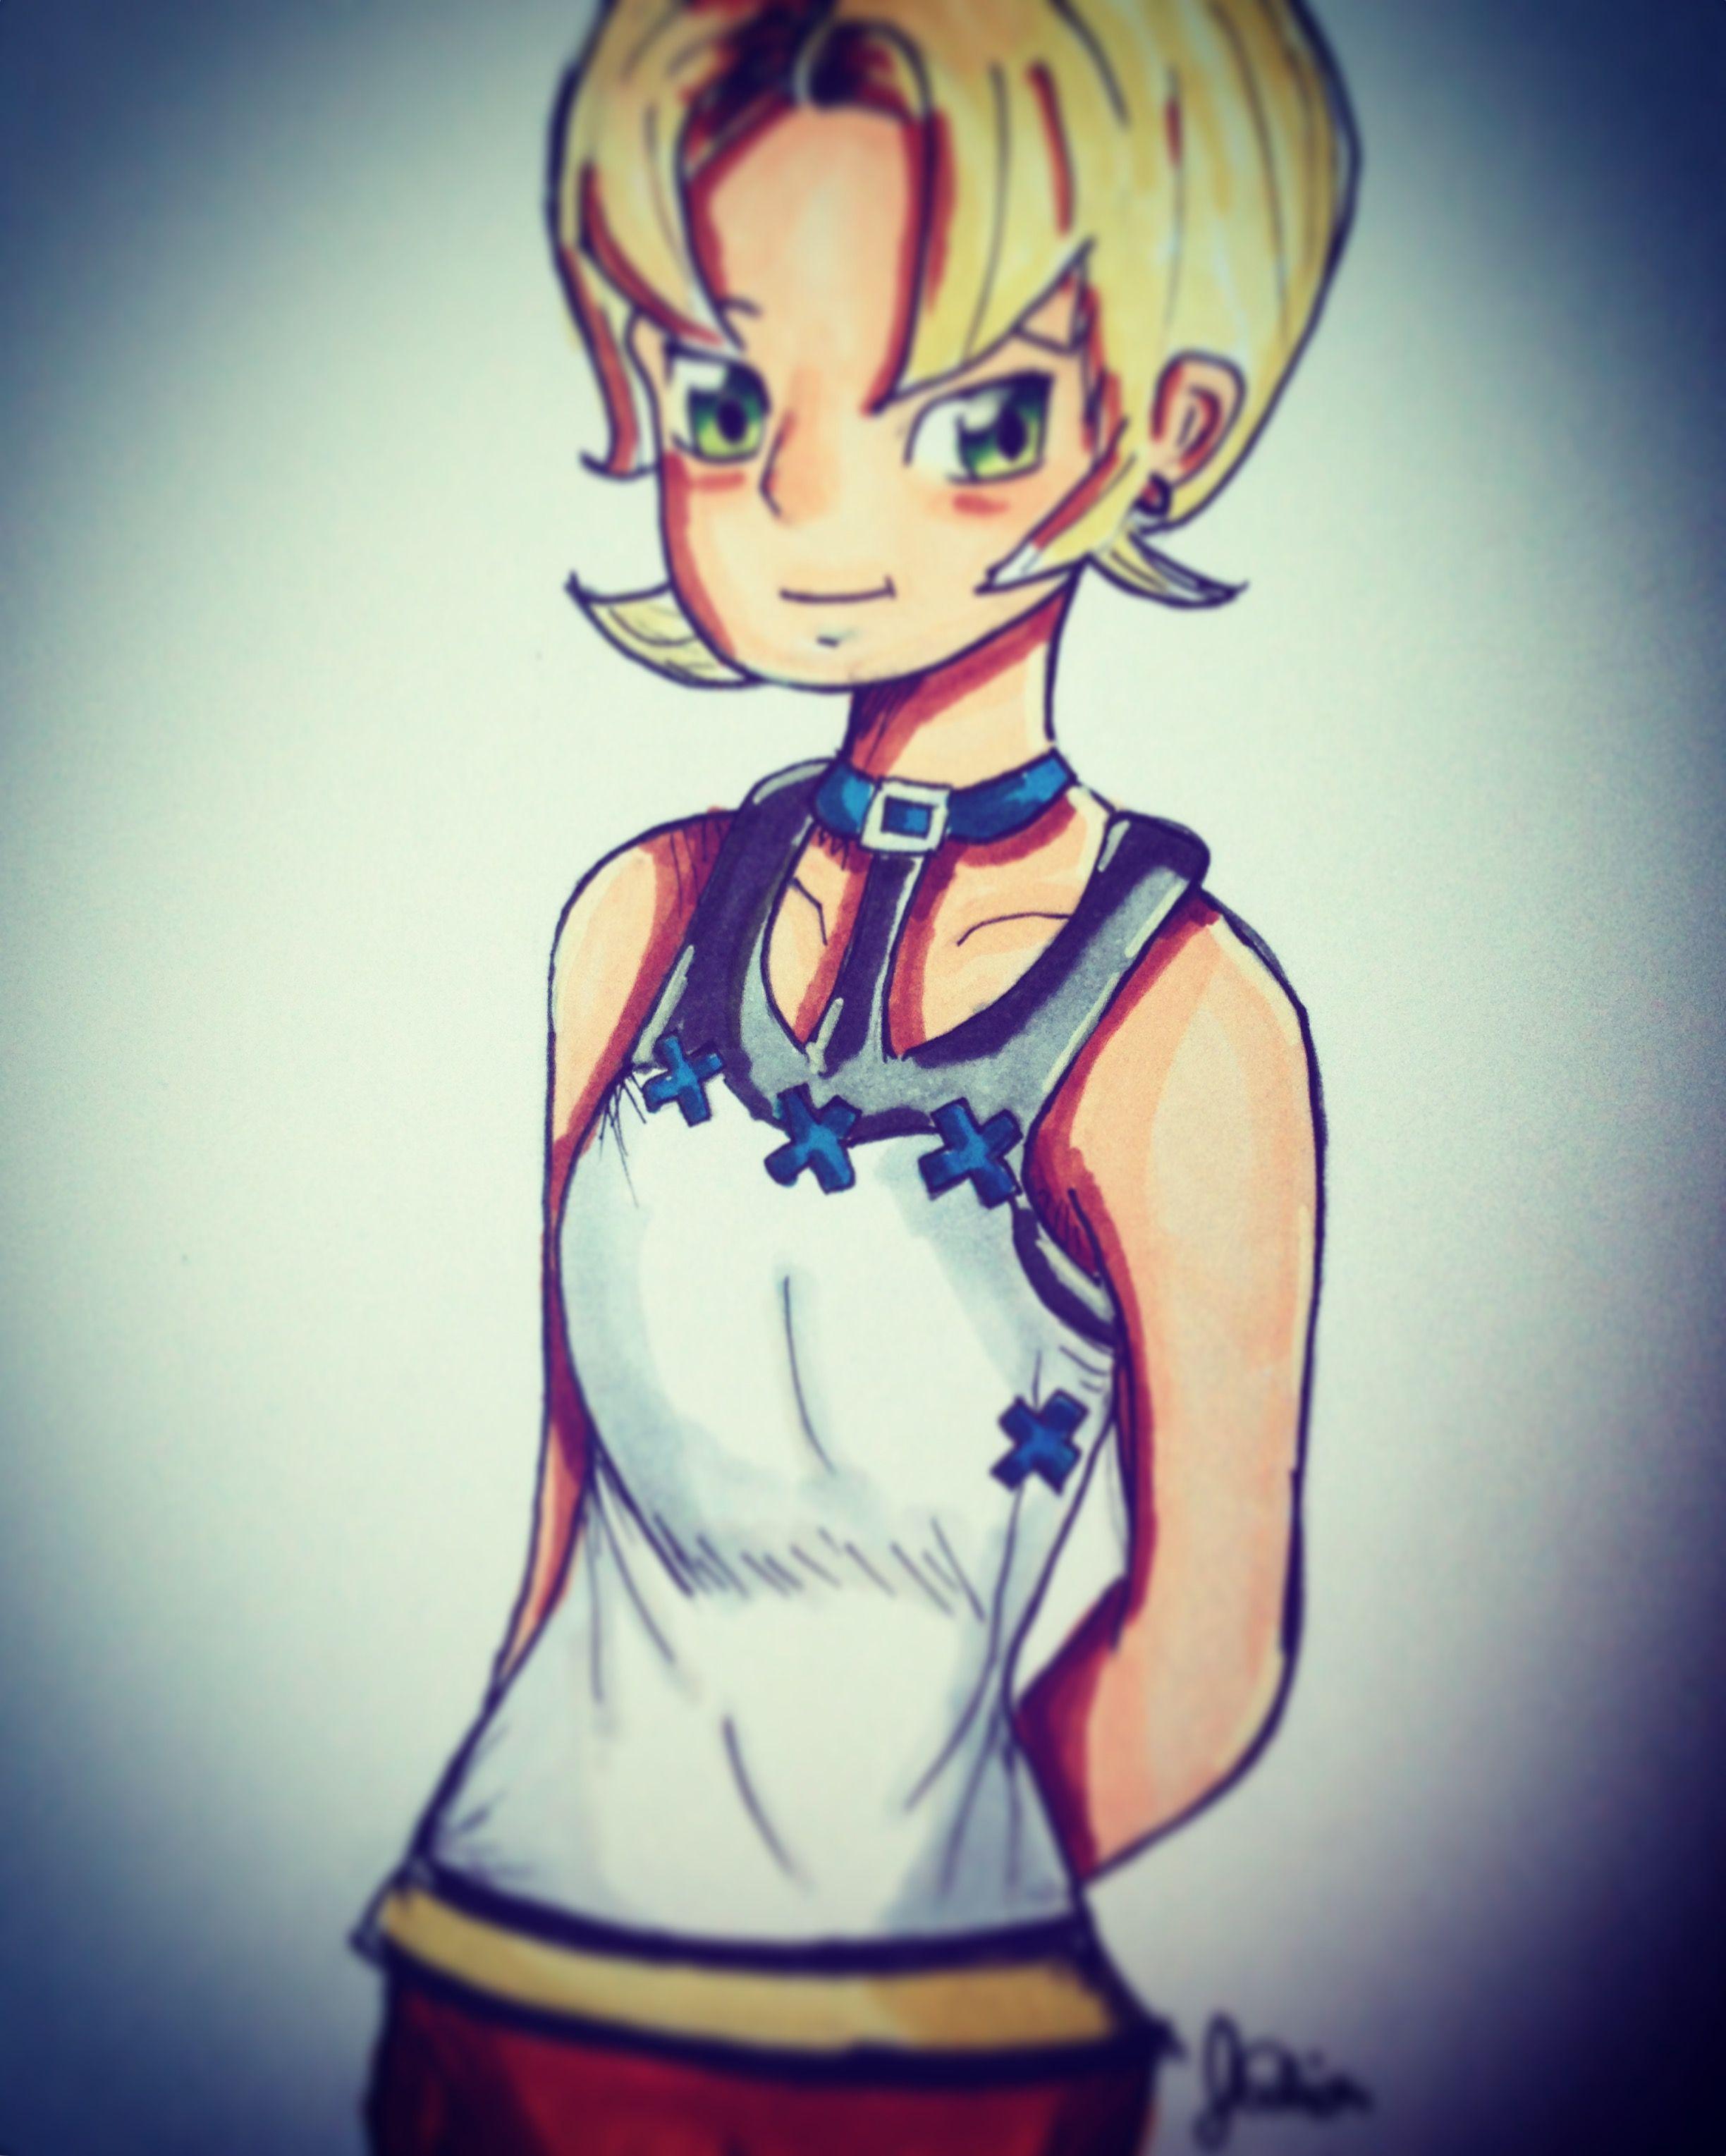 Ilia from Zelda: The Twilight Princess